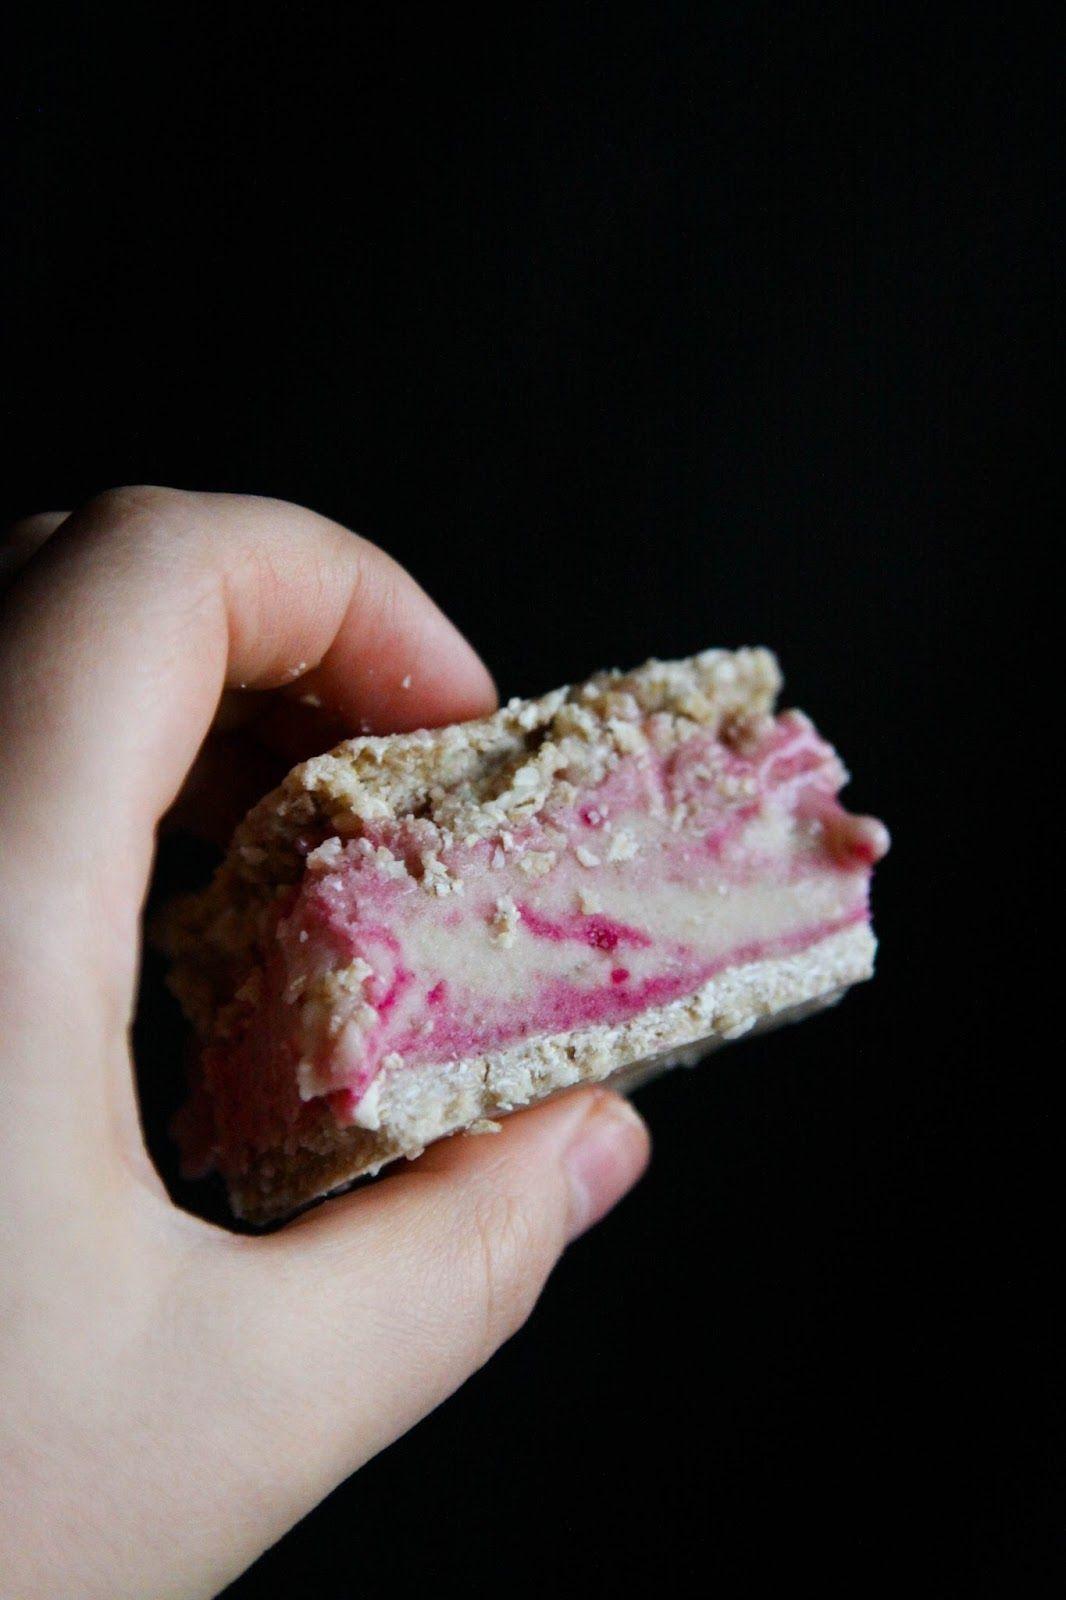 This Rawsome Vegan Life: Raw Vegan Ice Cream Sandwiches - oat cookies with bubblegum ice cream.